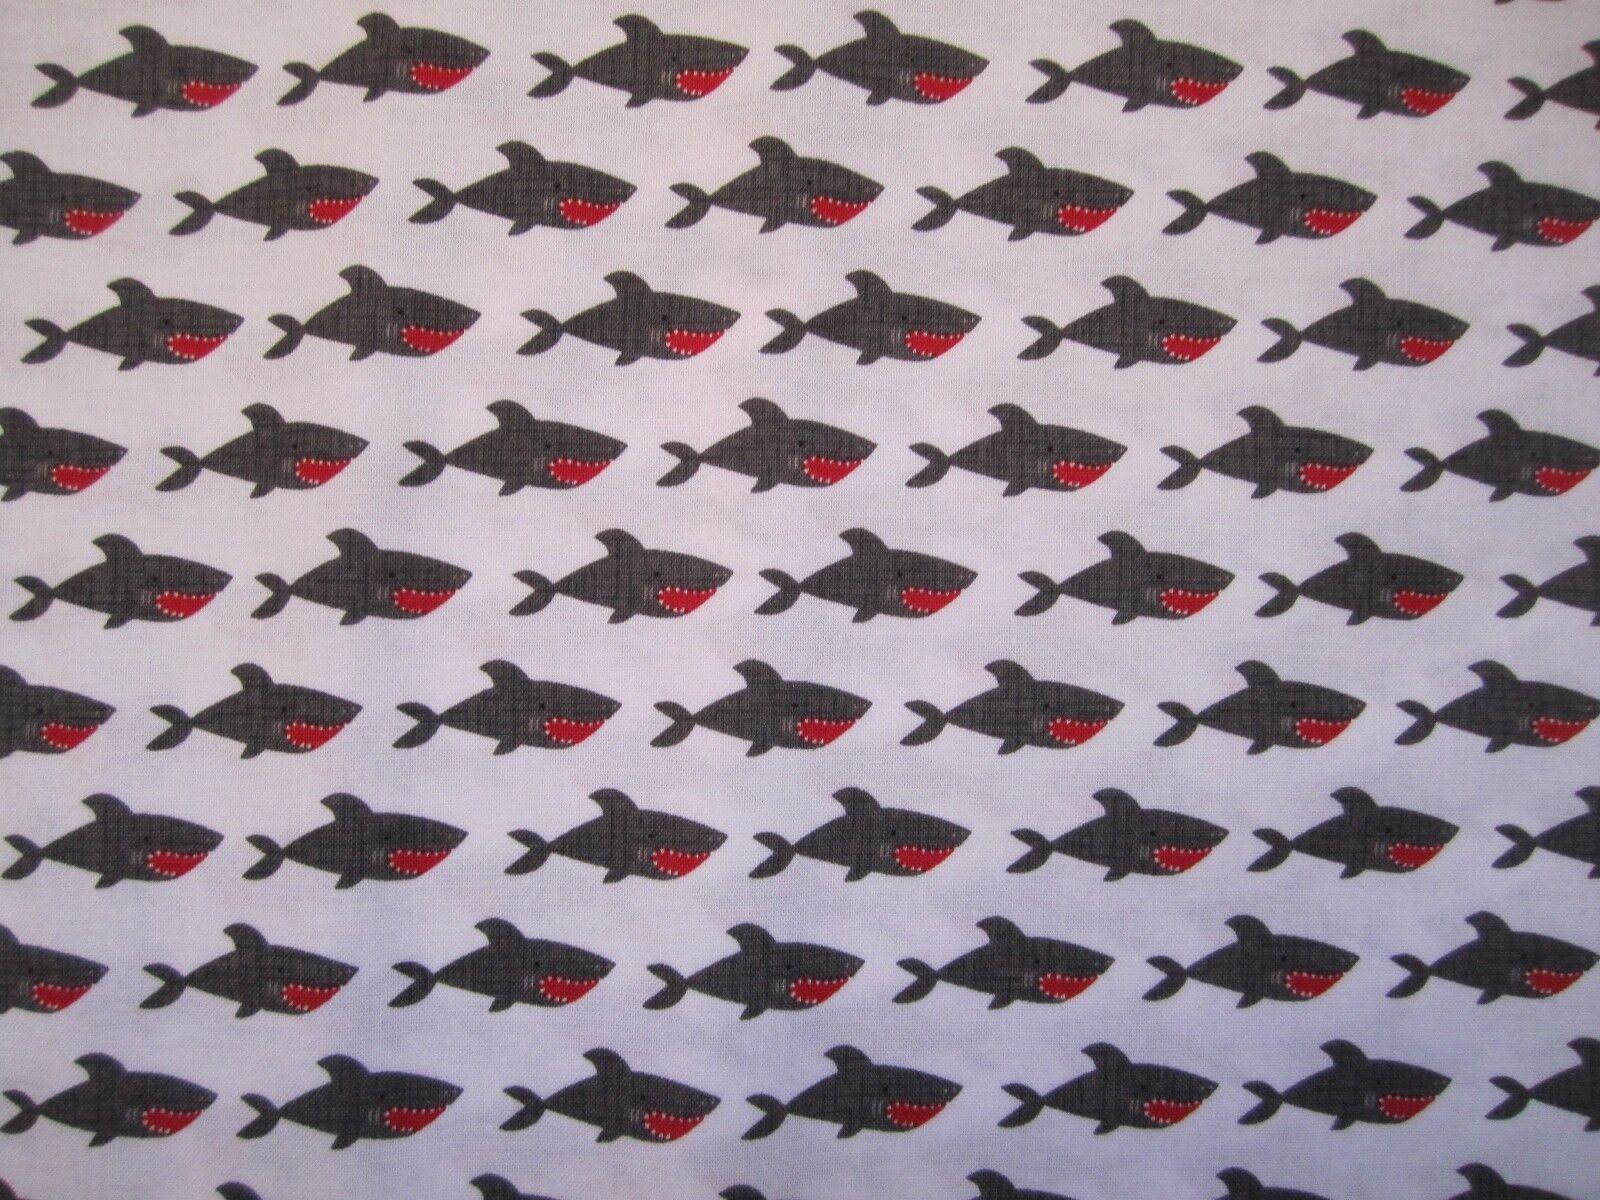 Blackbeard's Pirates Sharks on white 100% cotton Riley Blake